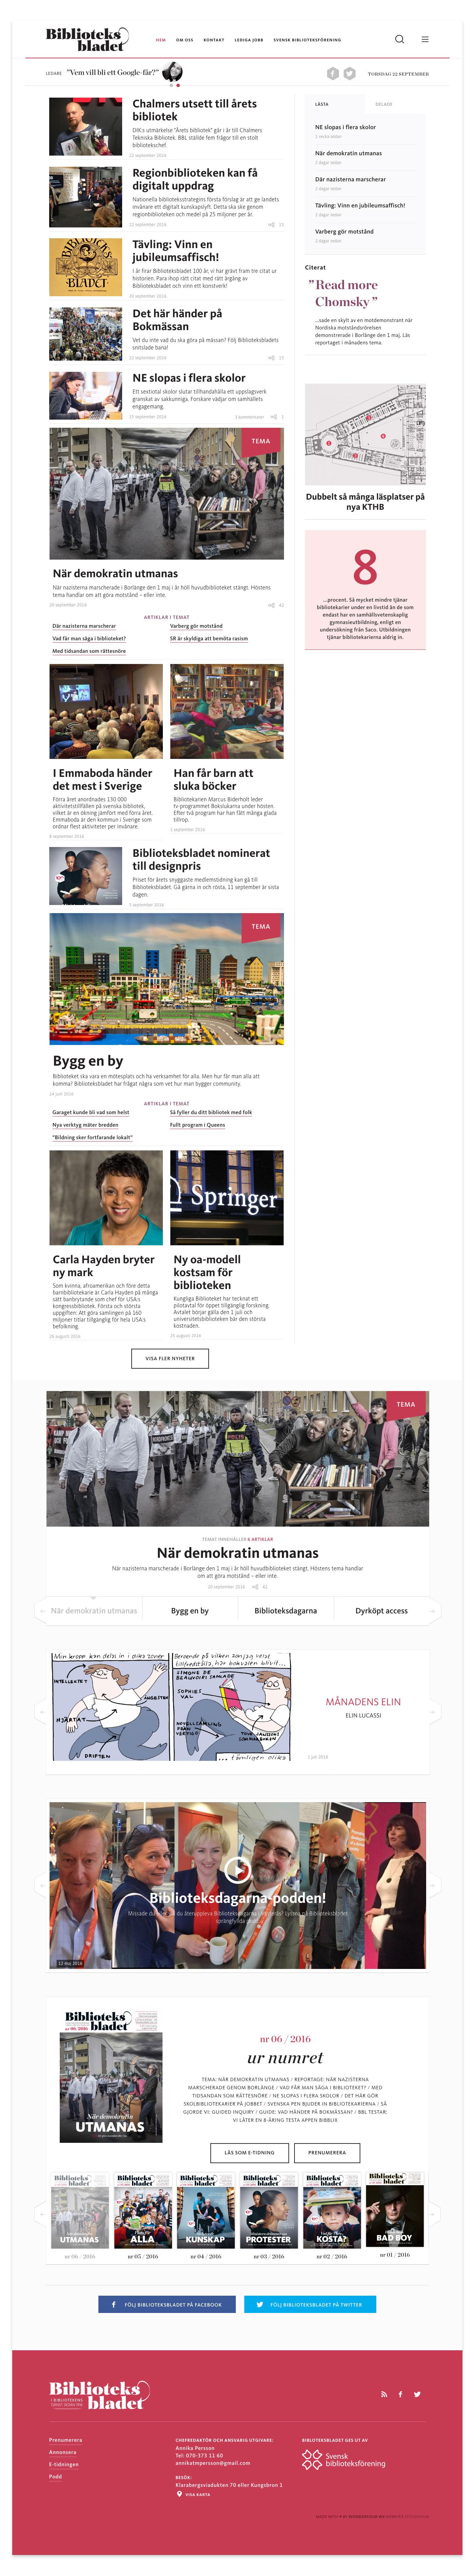 Biblioteksbladet Wonderfour webbyrå